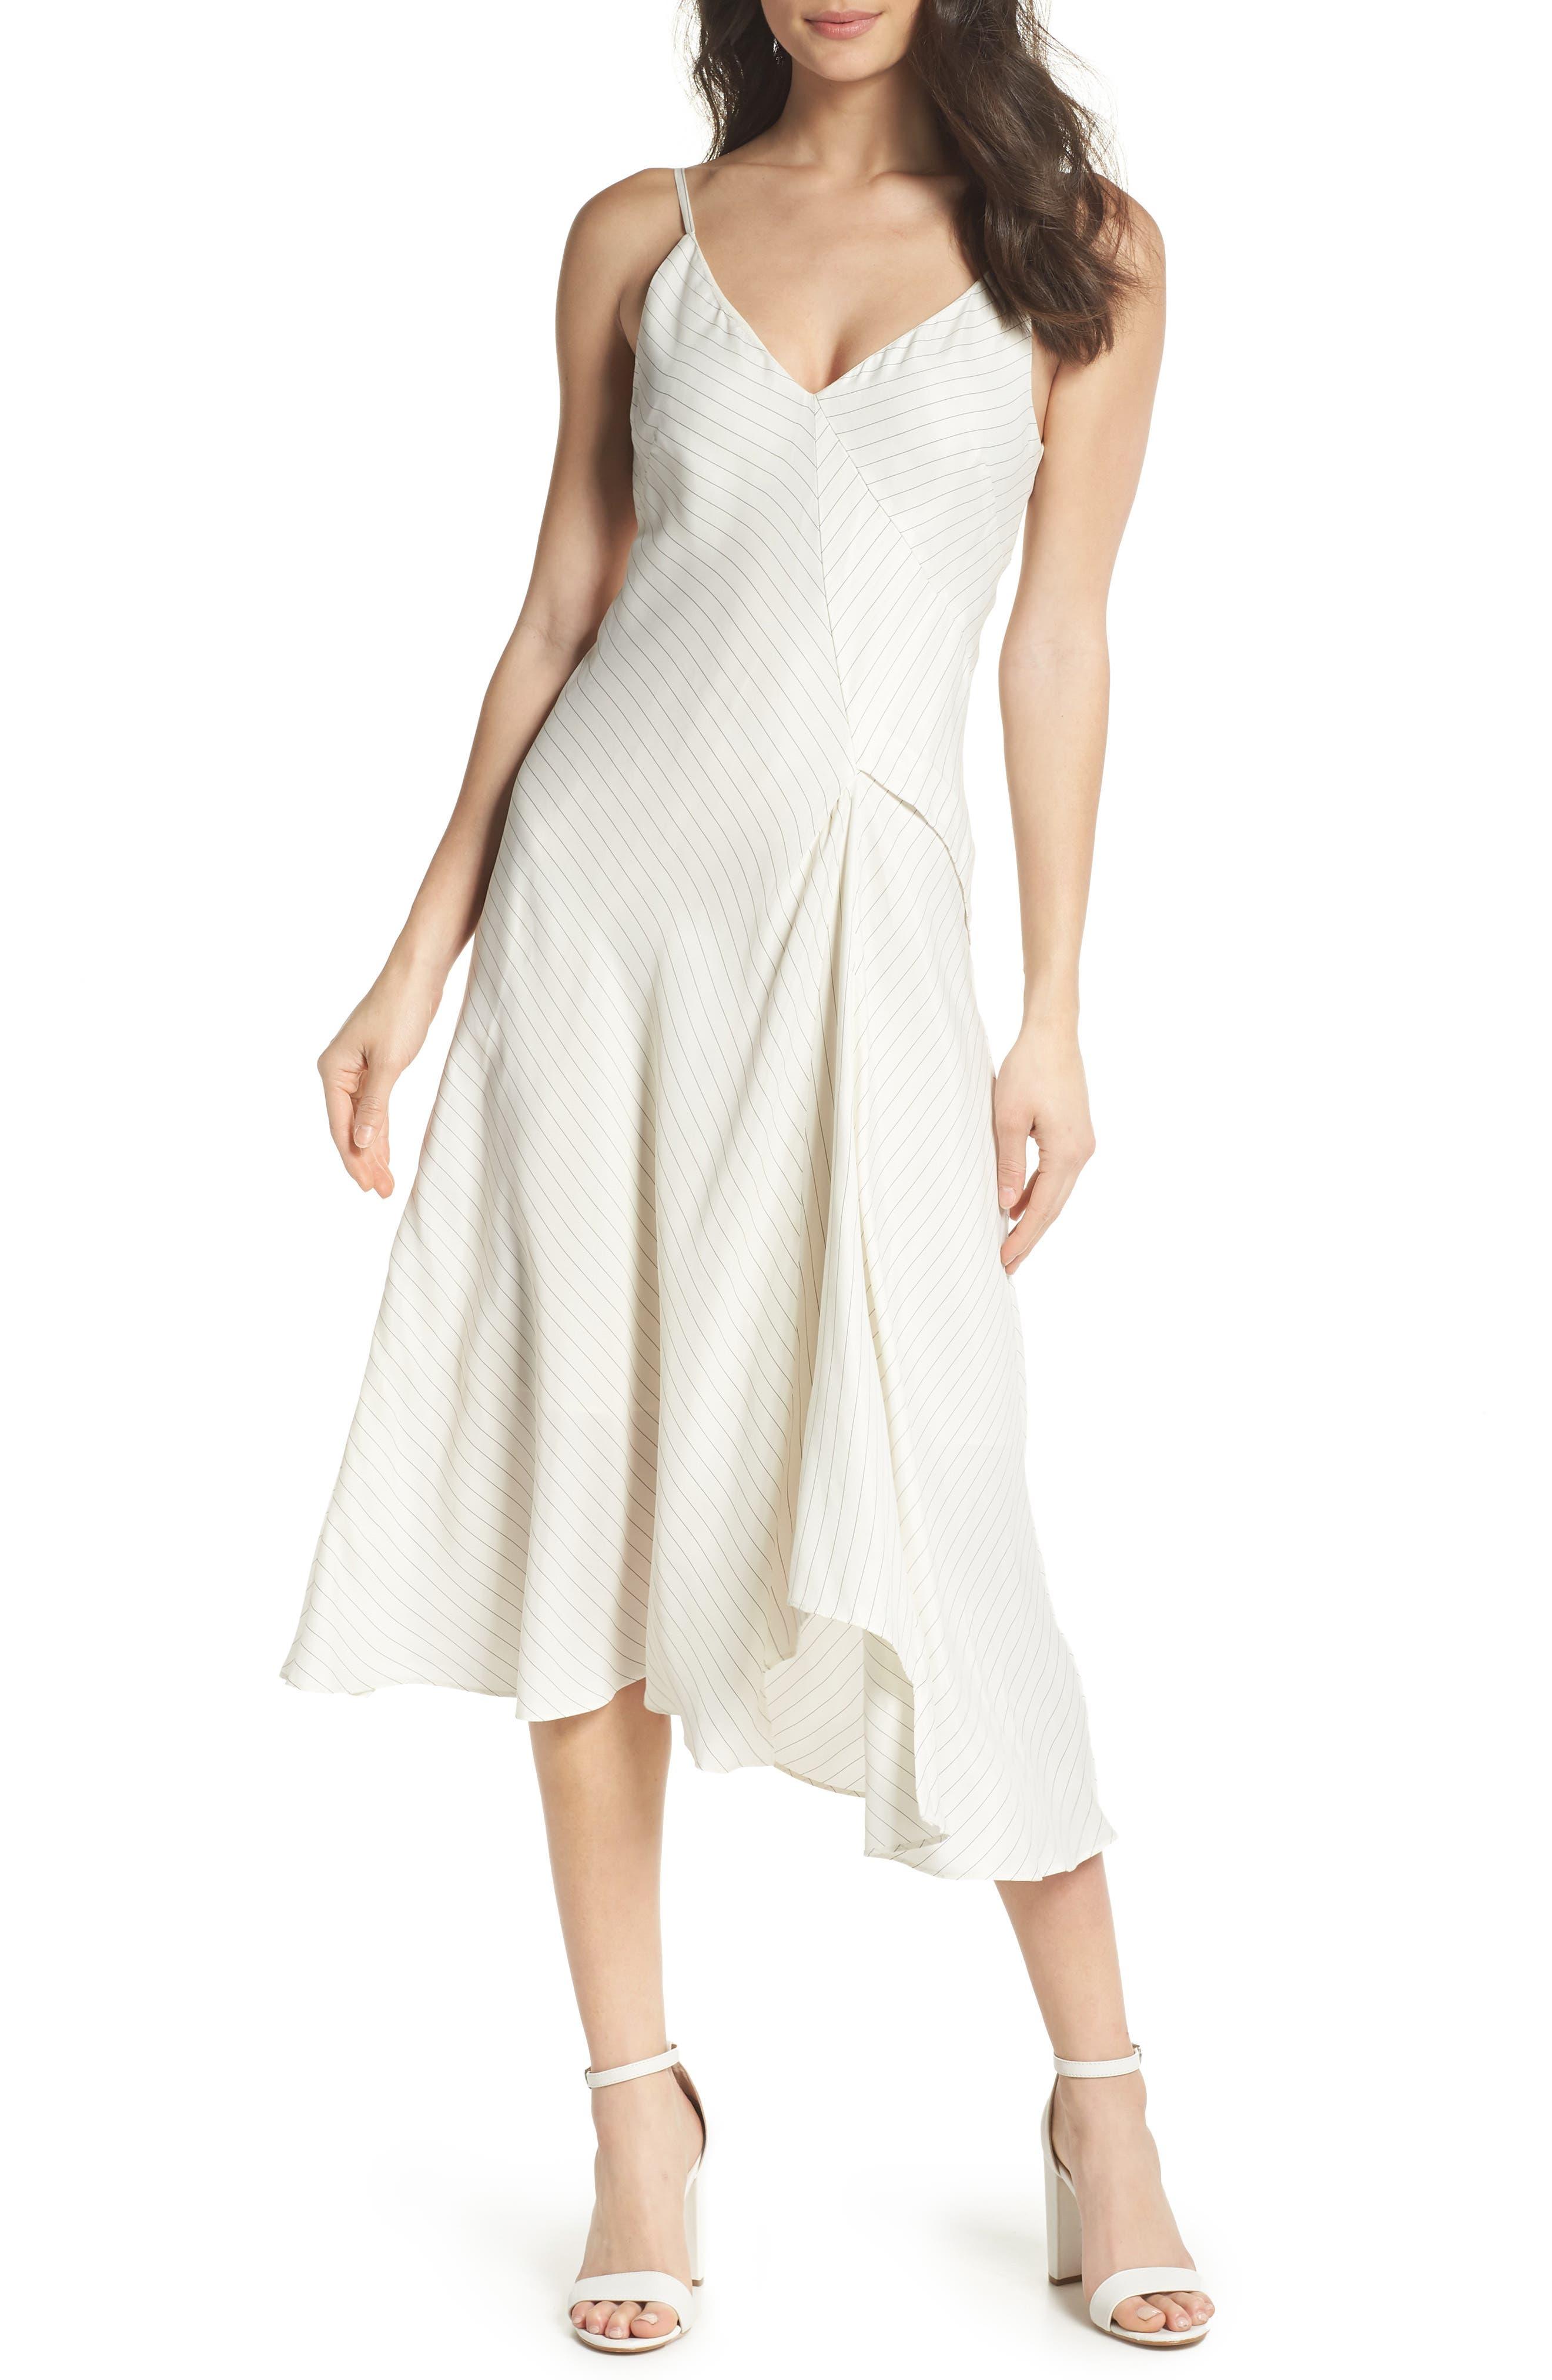 Bay Area Pinstripe Asymmetric Midi Dress,                             Main thumbnail 1, color,                             Cream